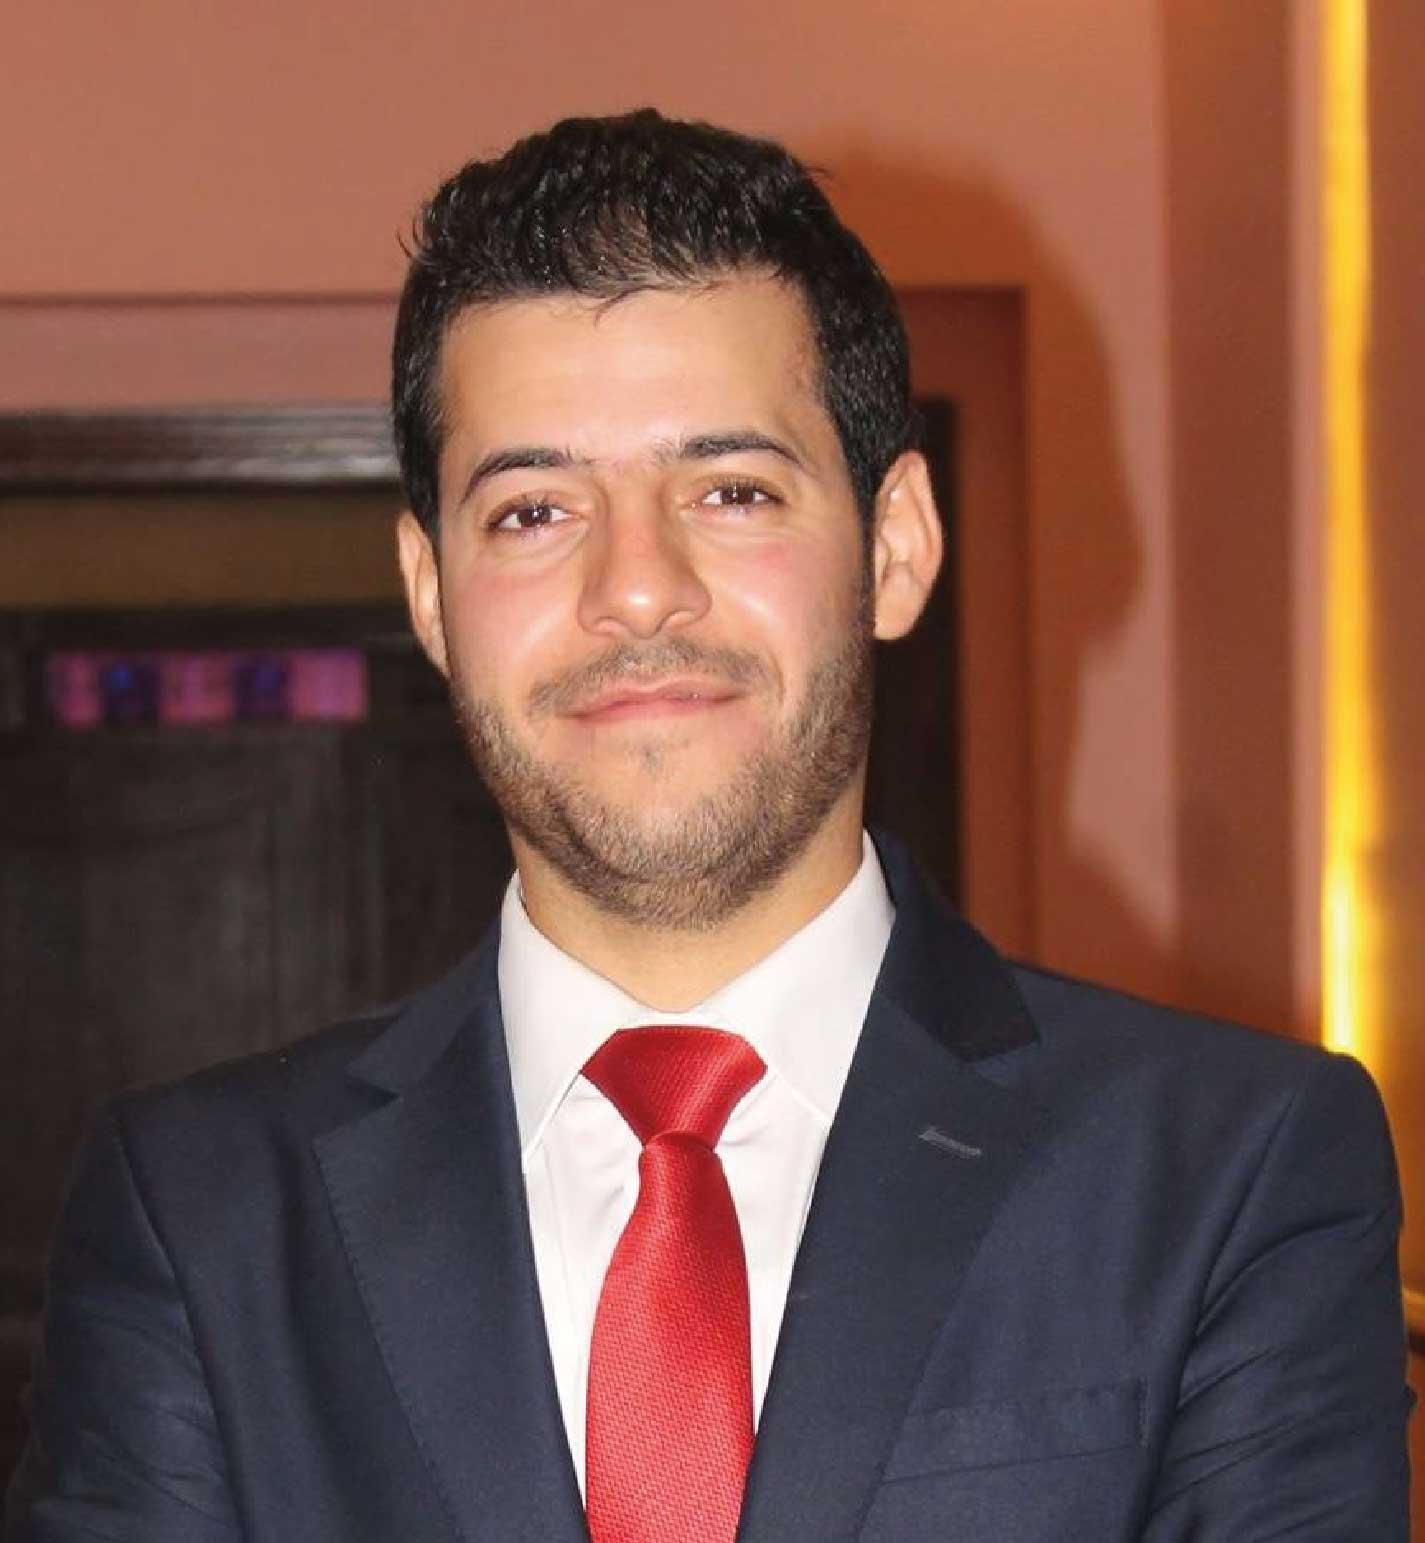 Eng. Rami Al-Zumer